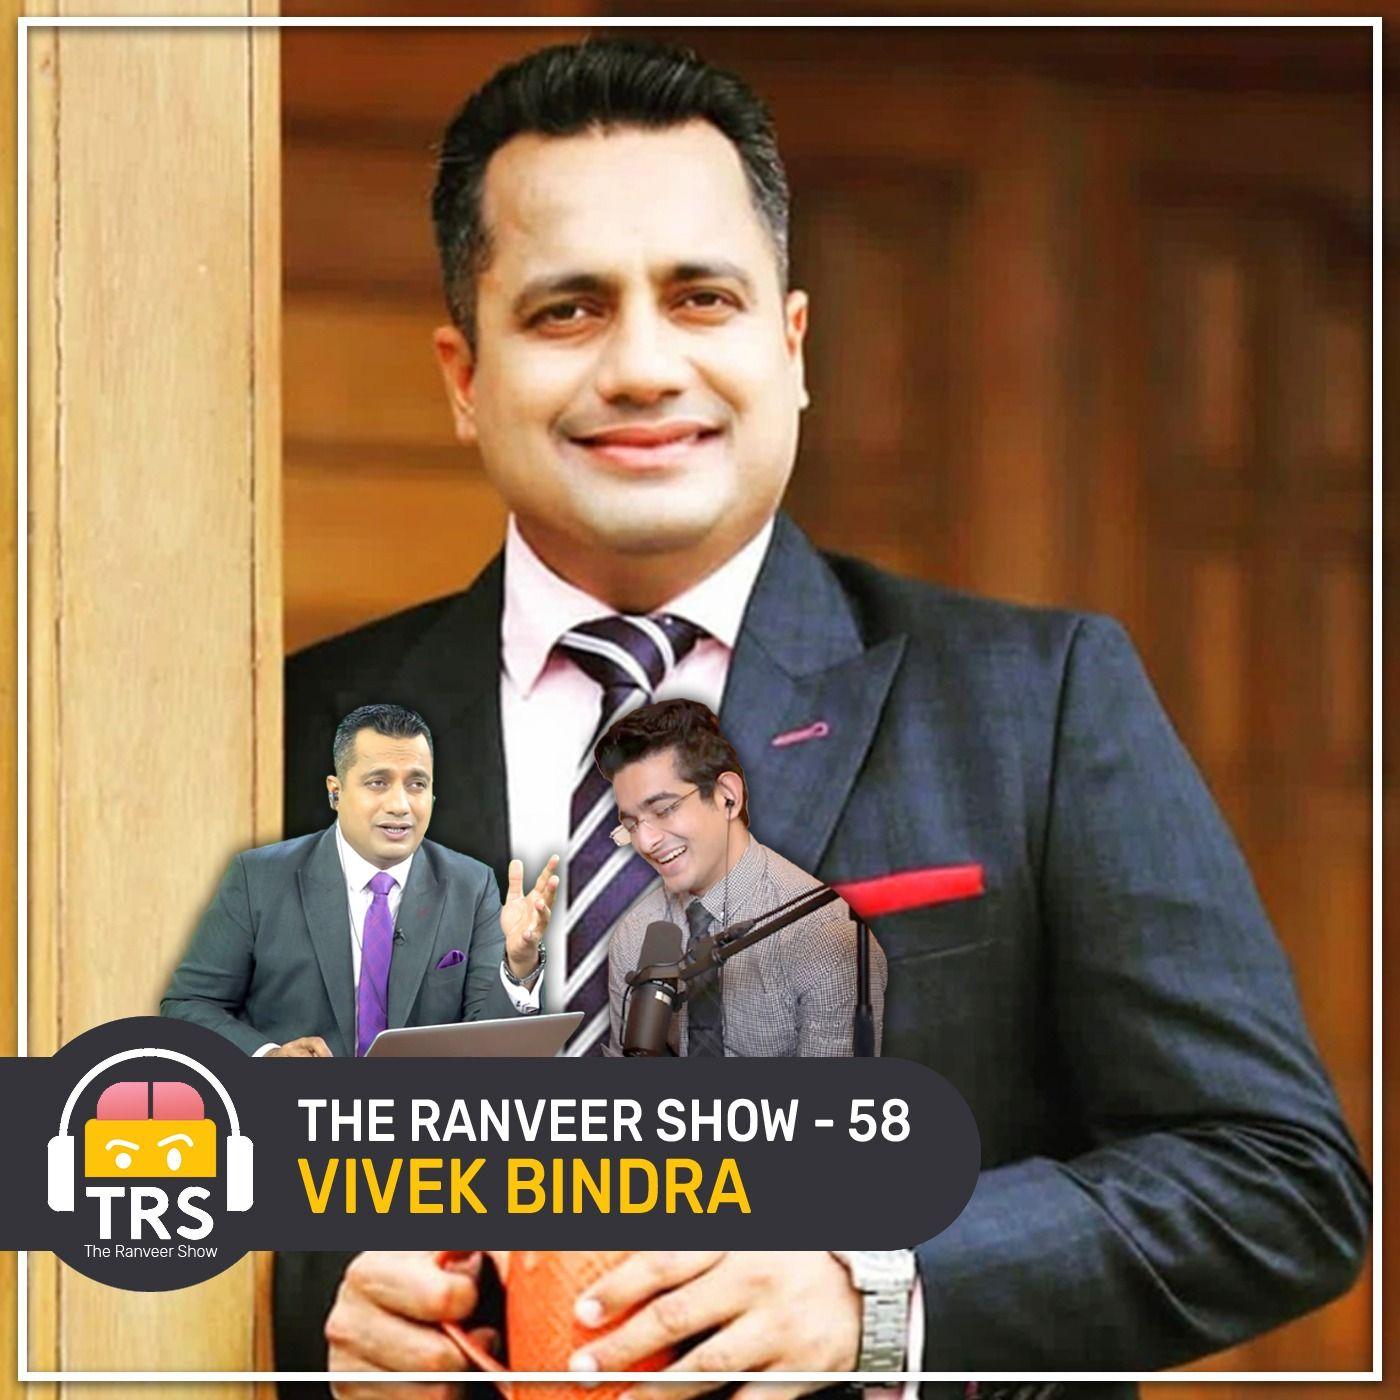 India's TOP Business Guru Vivek Bindra on Covid 19 Opportunities, Life Hacks, Celibacy And Motivation   The Ranveer Show 58